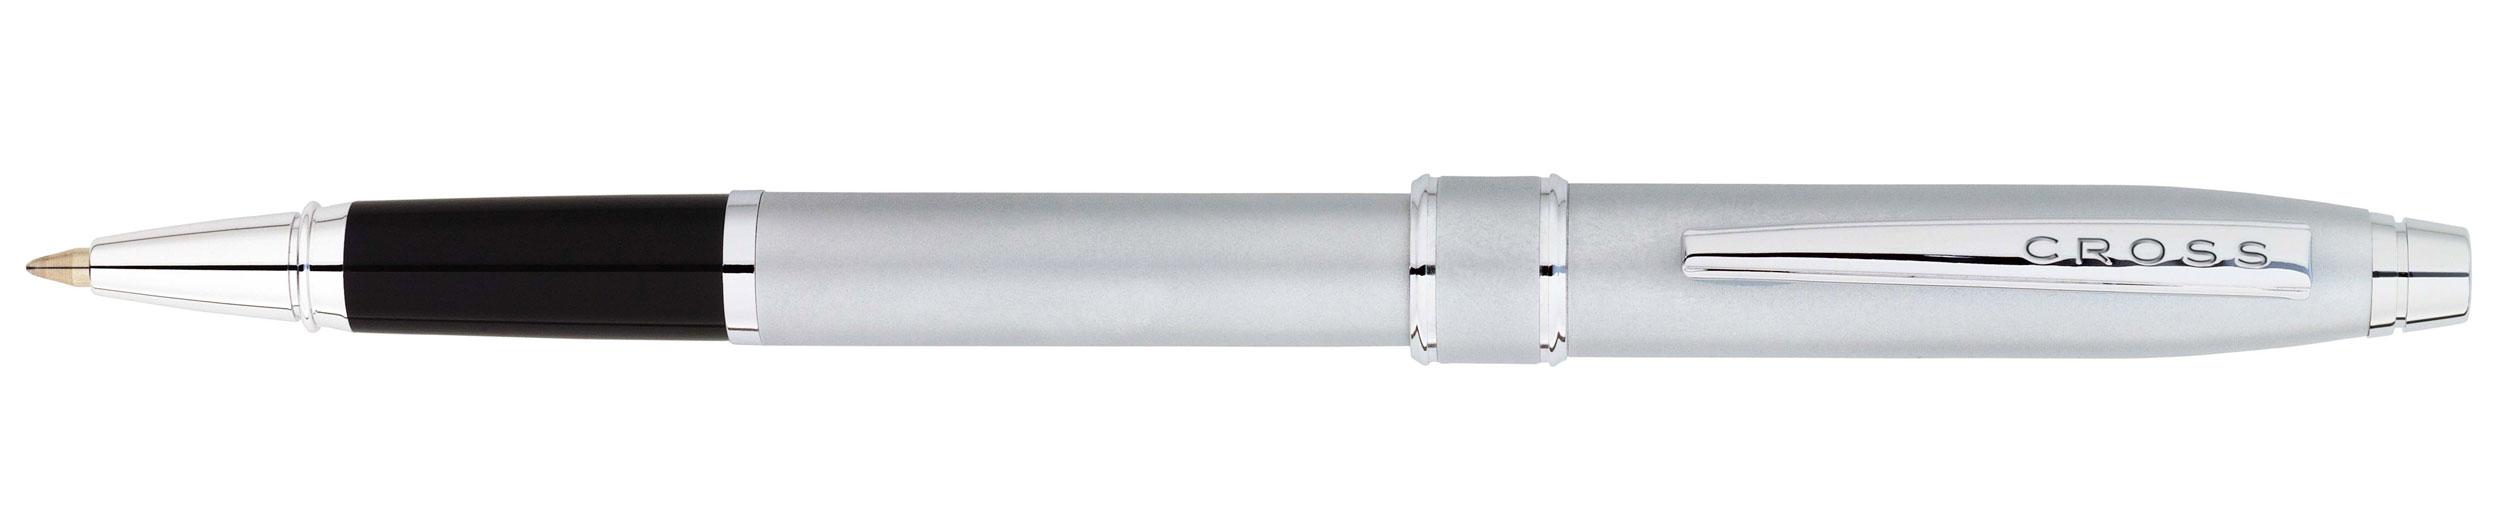 Купить Ручка-роллер CROSS AT0175-2, Серебристый, Stratford